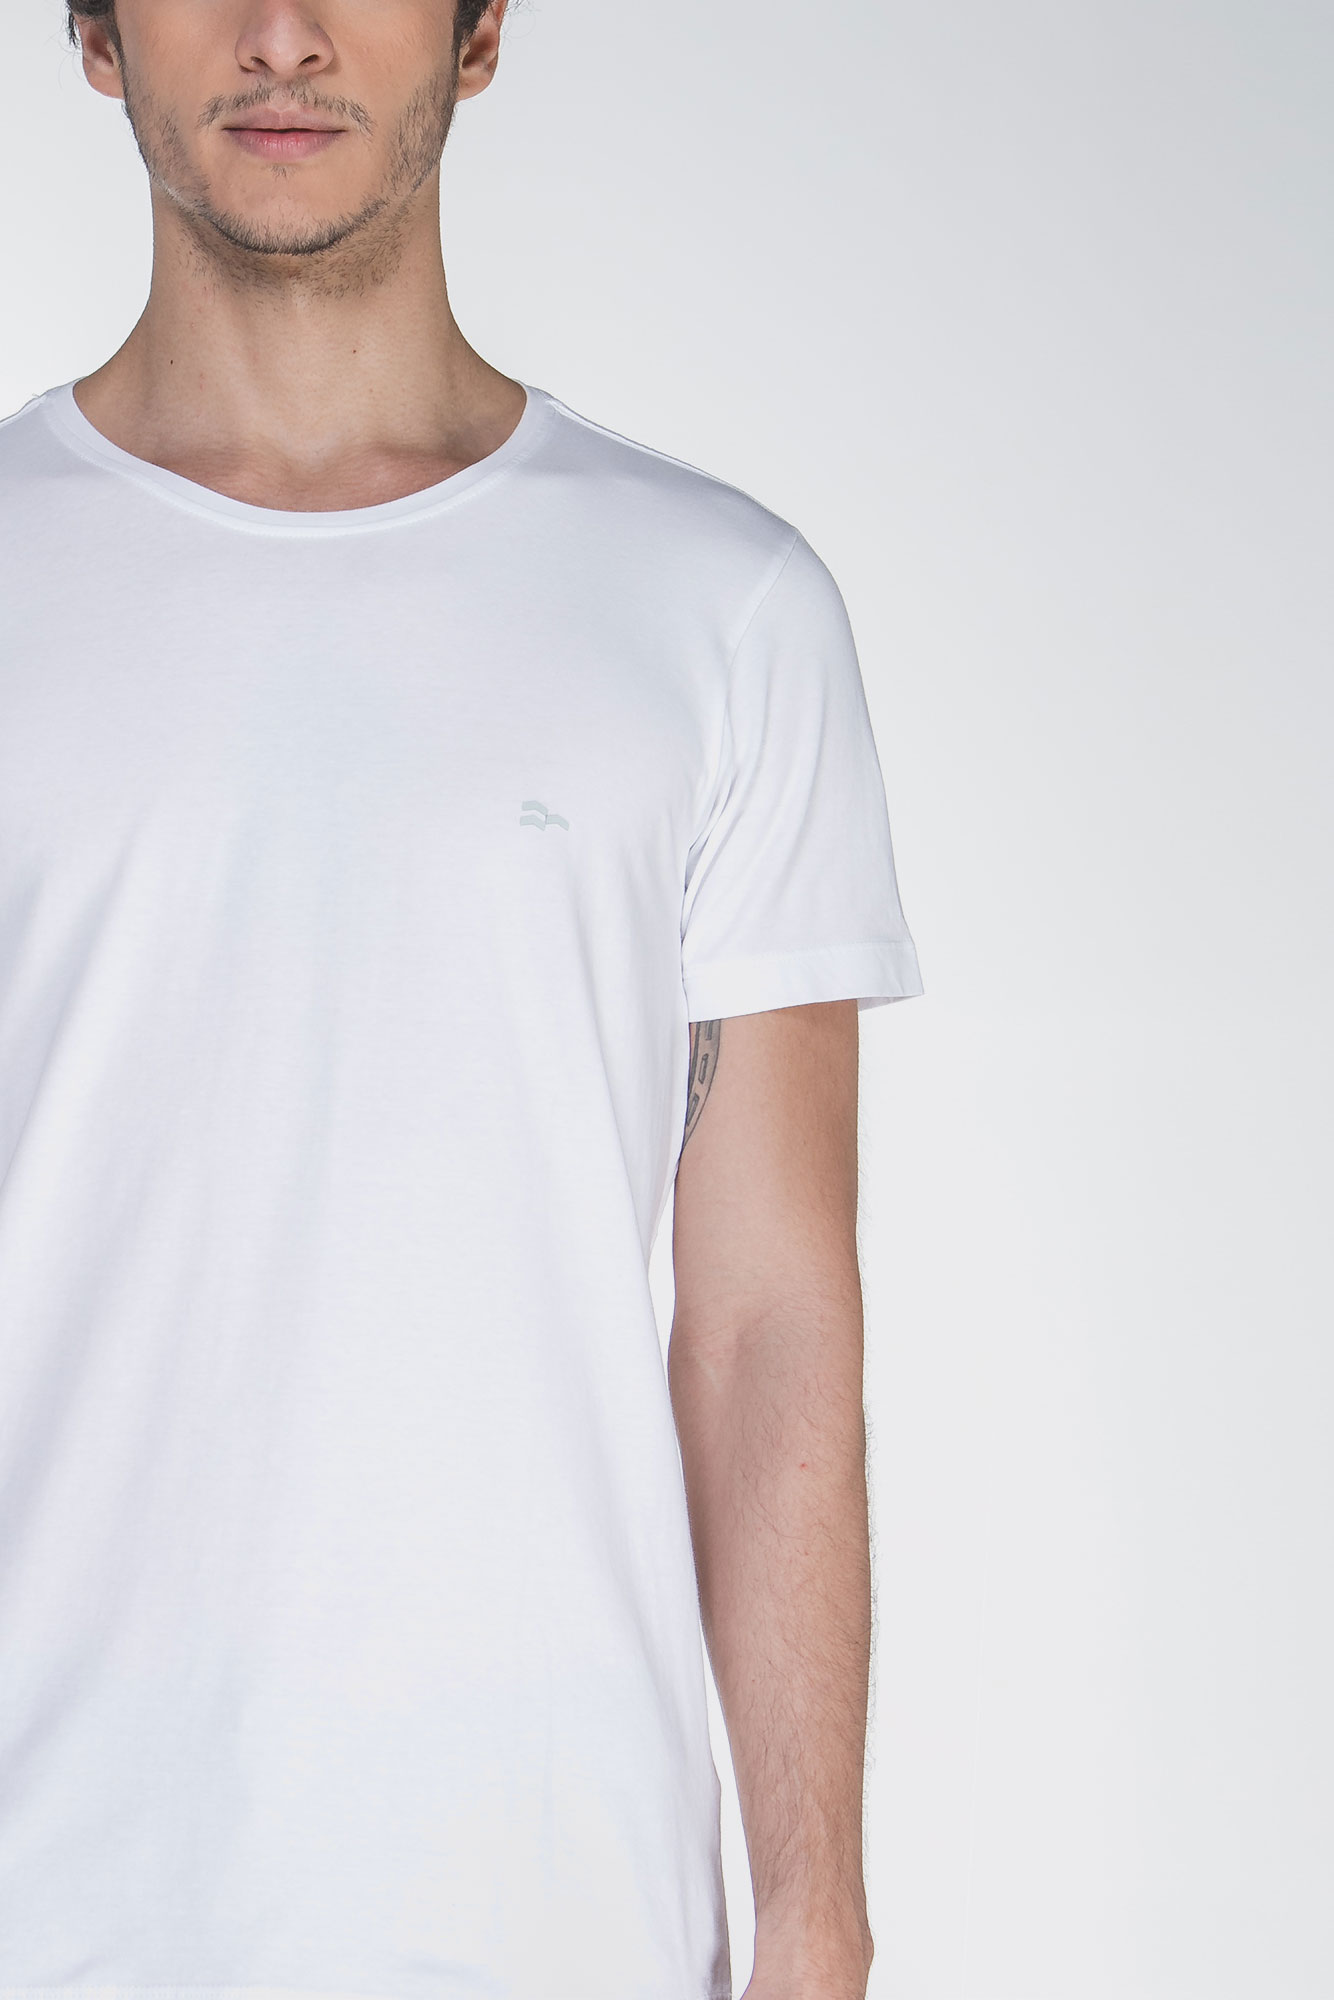 Camiseta Basic Egypt Branco/Branco